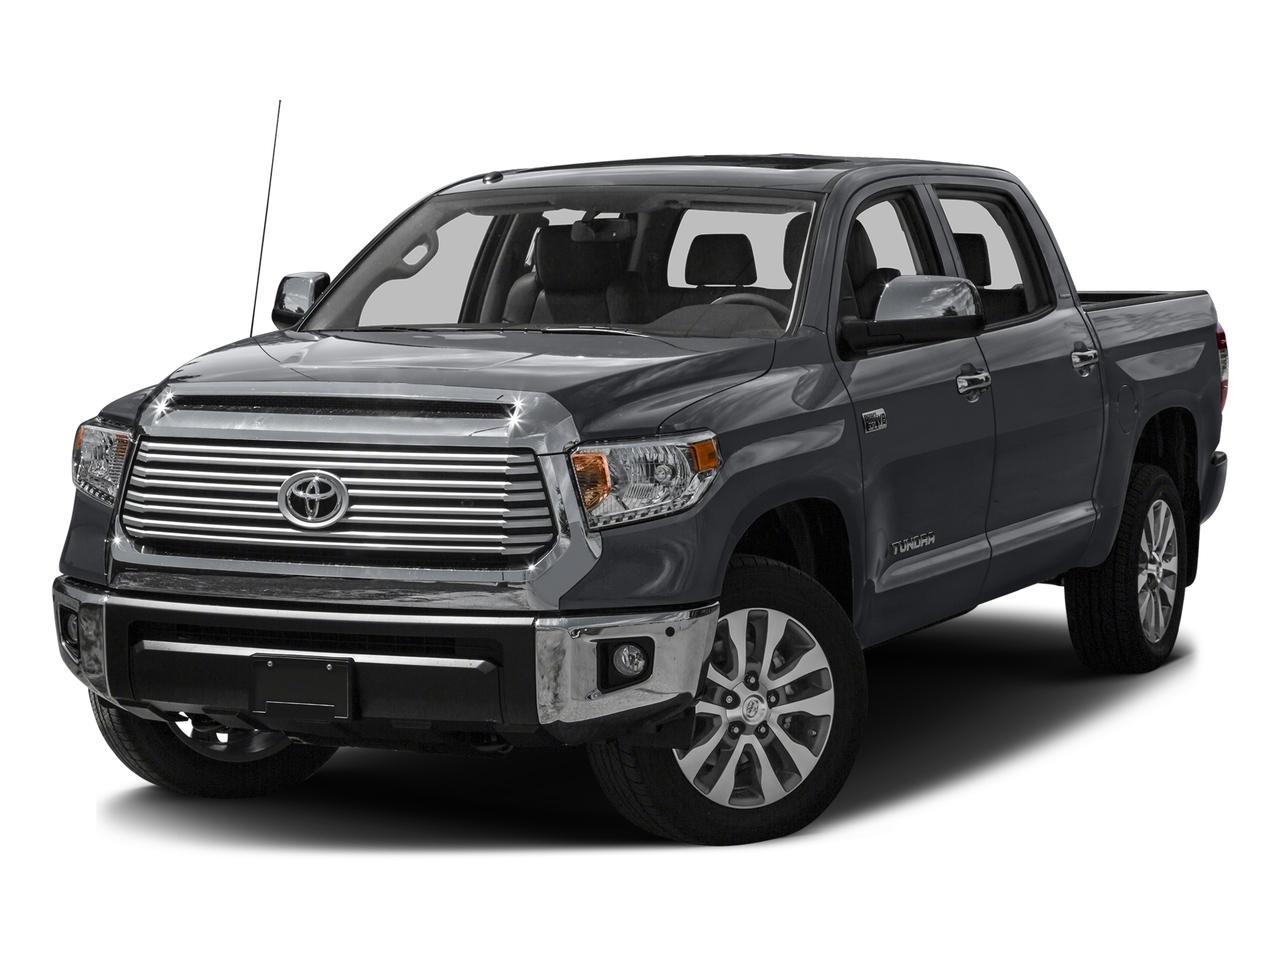 2016 Toyota Tundra 4WD Truck Vehicle Photo in MIDLAND, TX 79703-7718